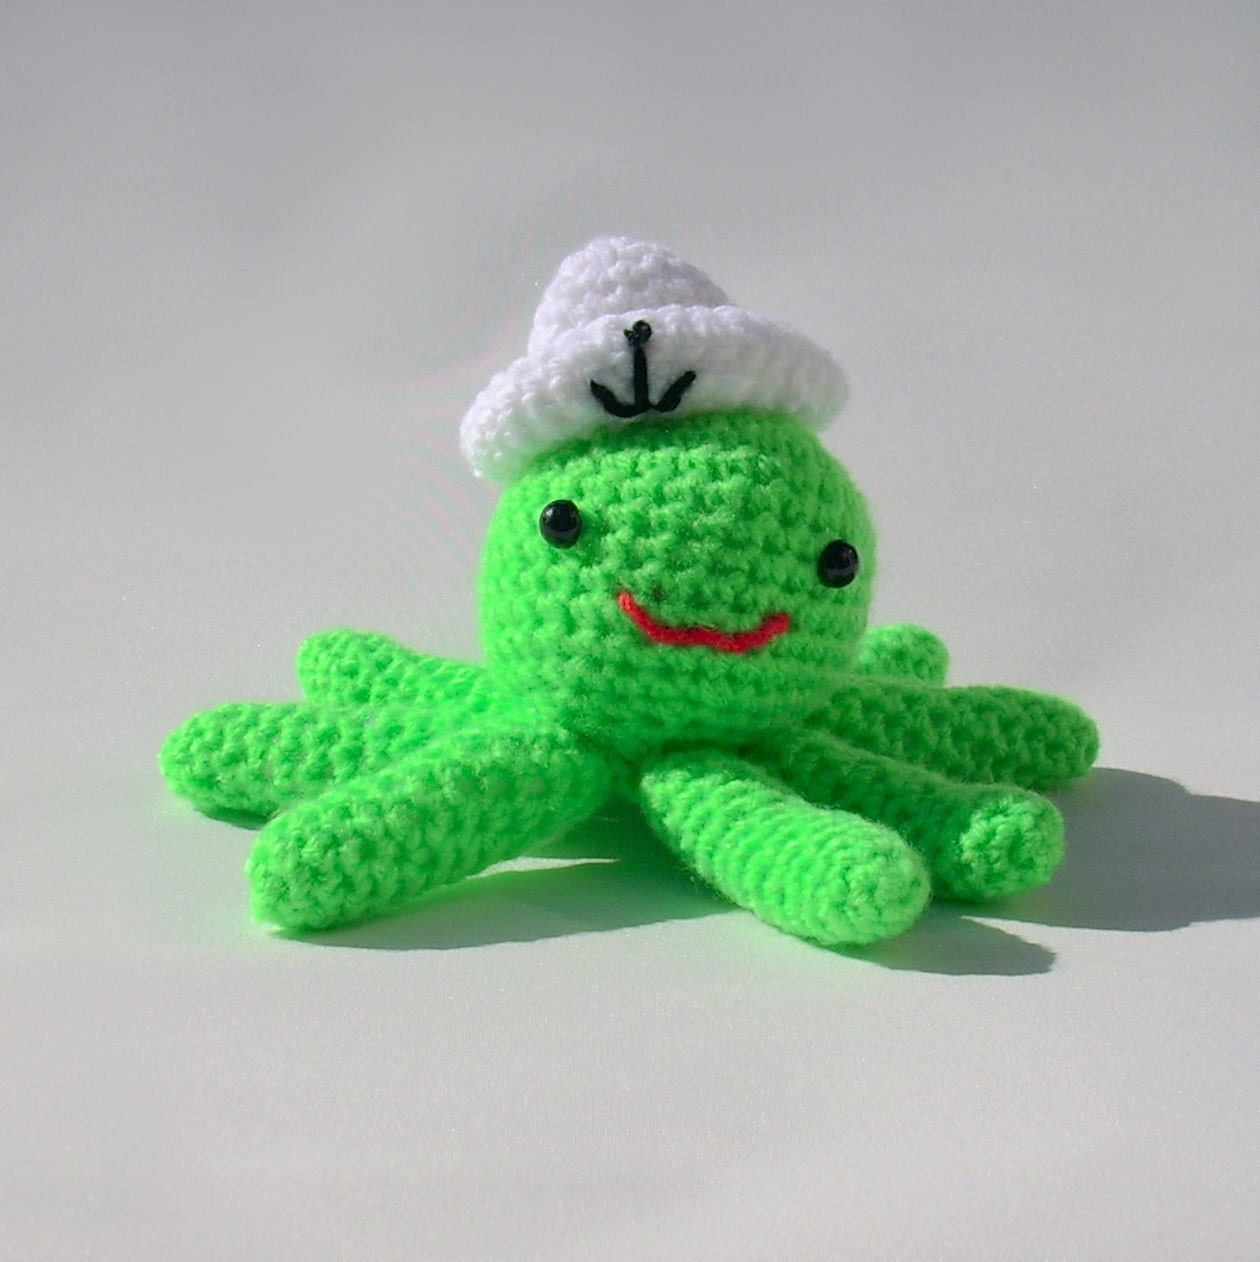 Amigurumi Pikachu Pattern Free : Amigurumi Squid octopus toy Rupert the squid handmade by ...